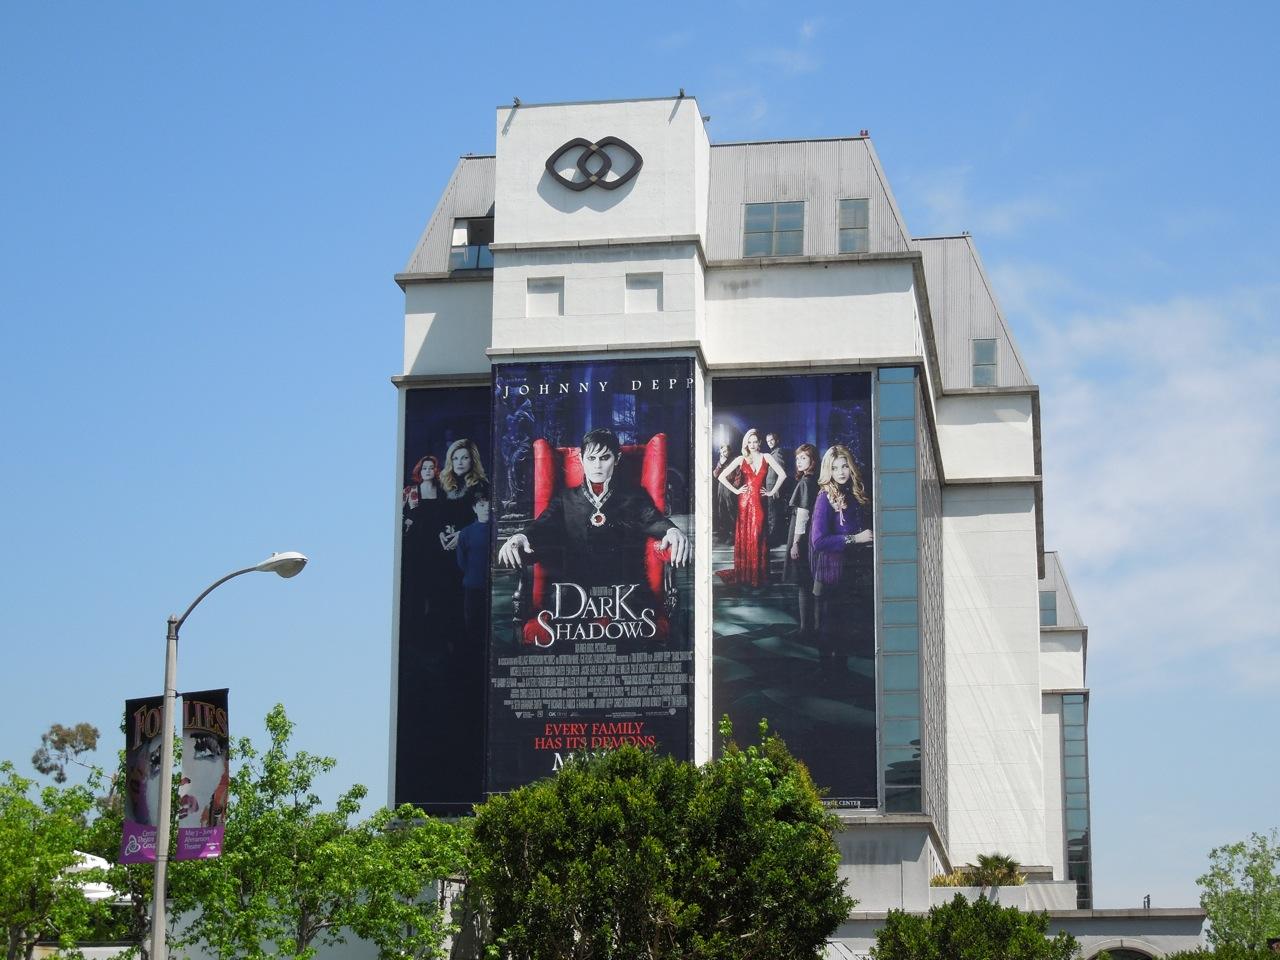 http://2.bp.blogspot.com/-QmARSUHqfgc/T5HthEPnQOI/AAAAAAAAqoE/aLwMENHvQOU/s1600/giant+dark+shadows+billboard.jpg